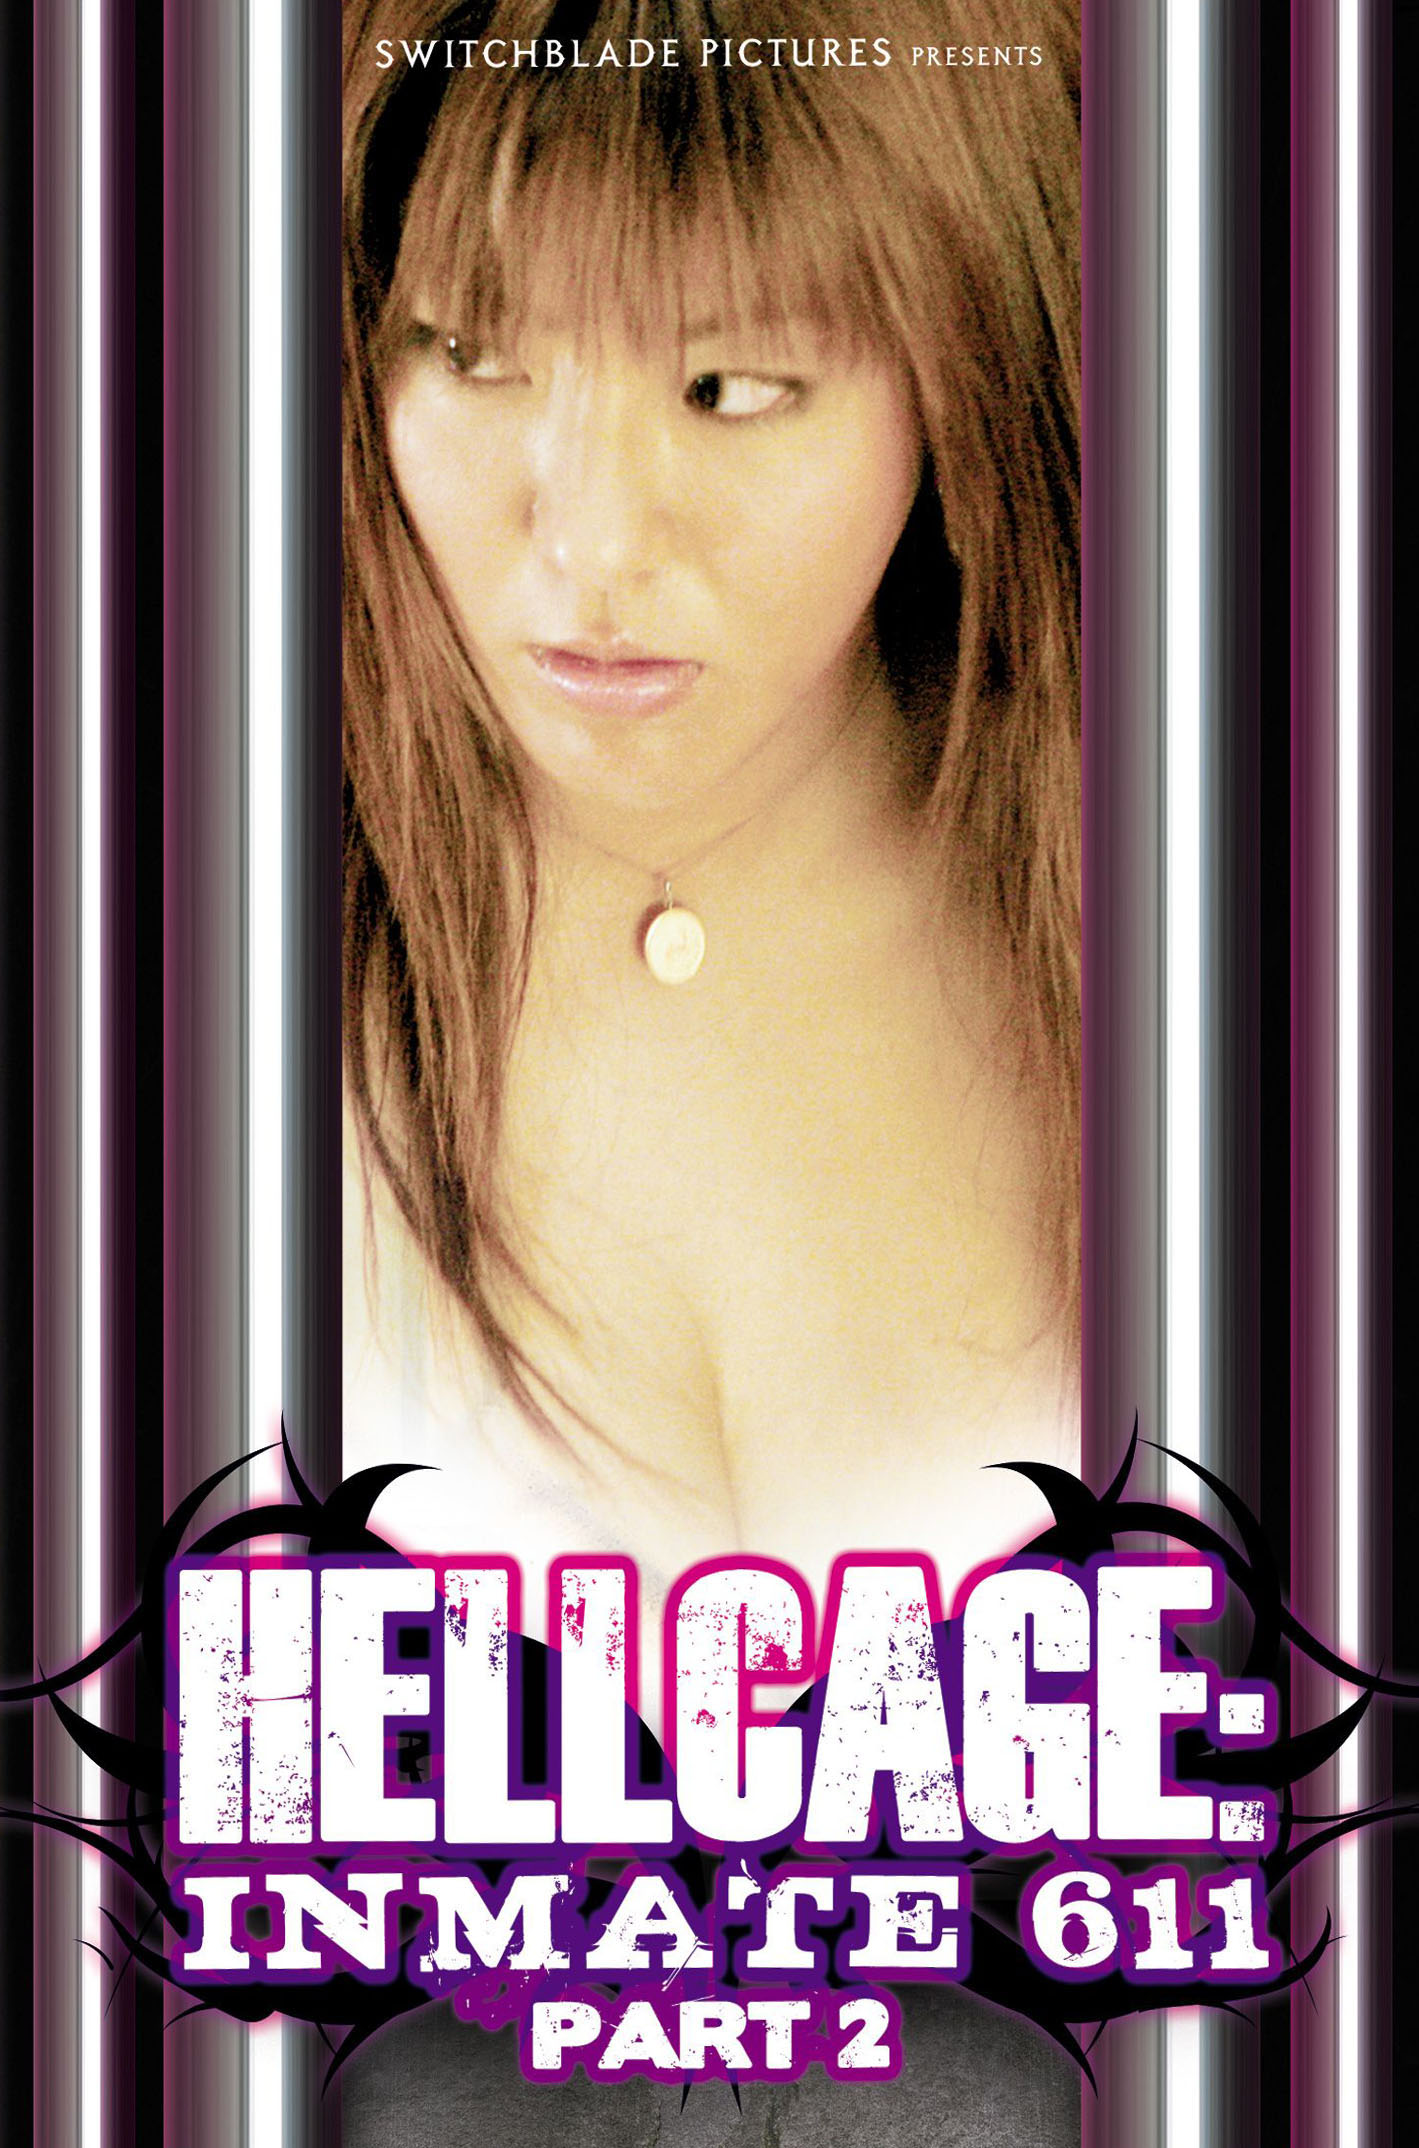 Hellcage: Inmate 611 Part II